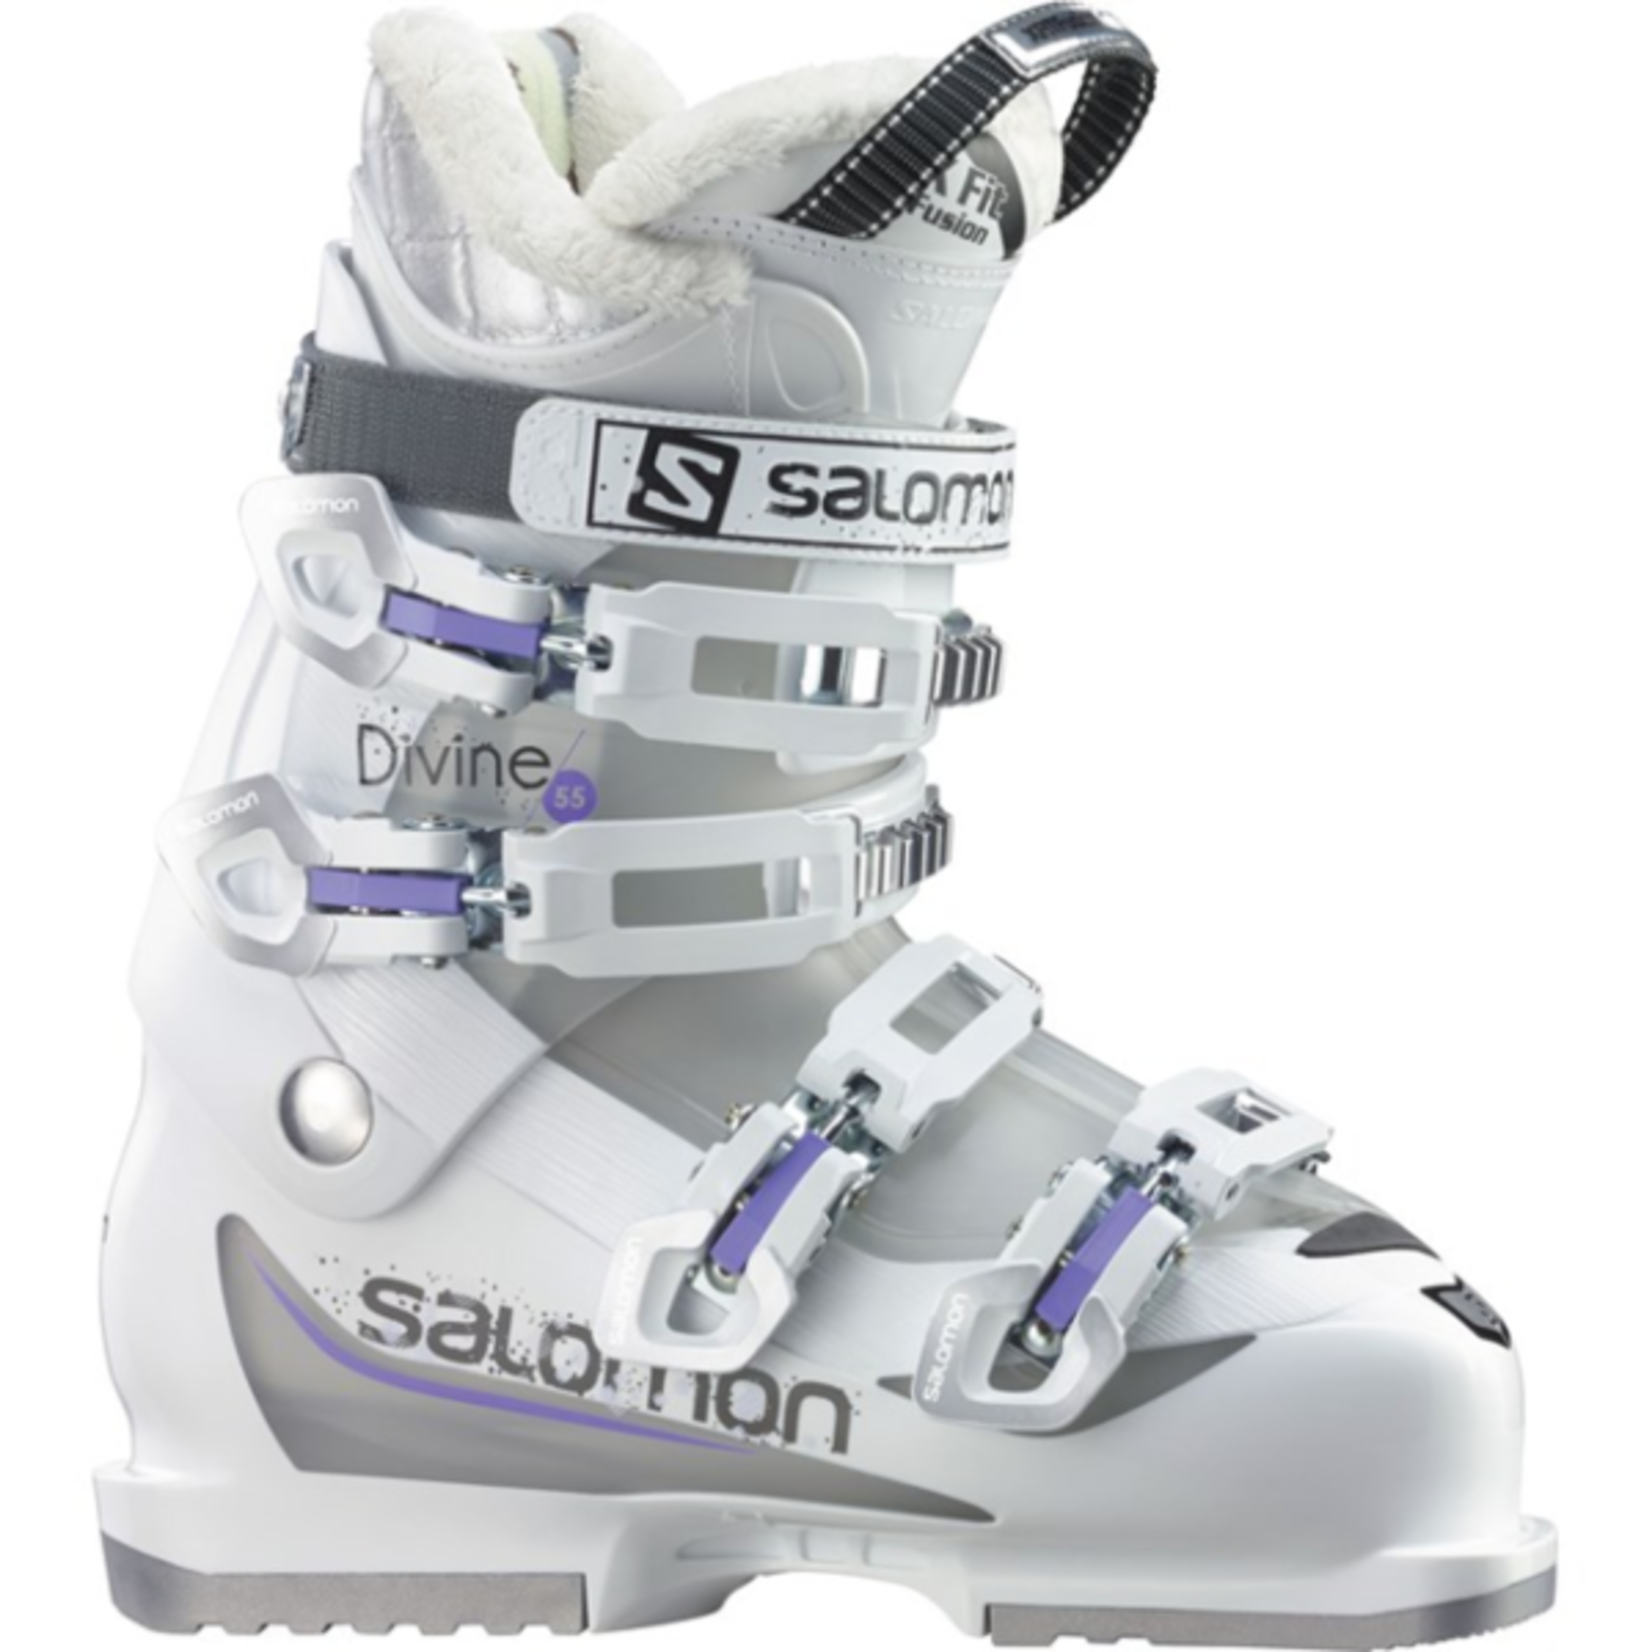 Salomon Divine 55 White Crystal 26.5